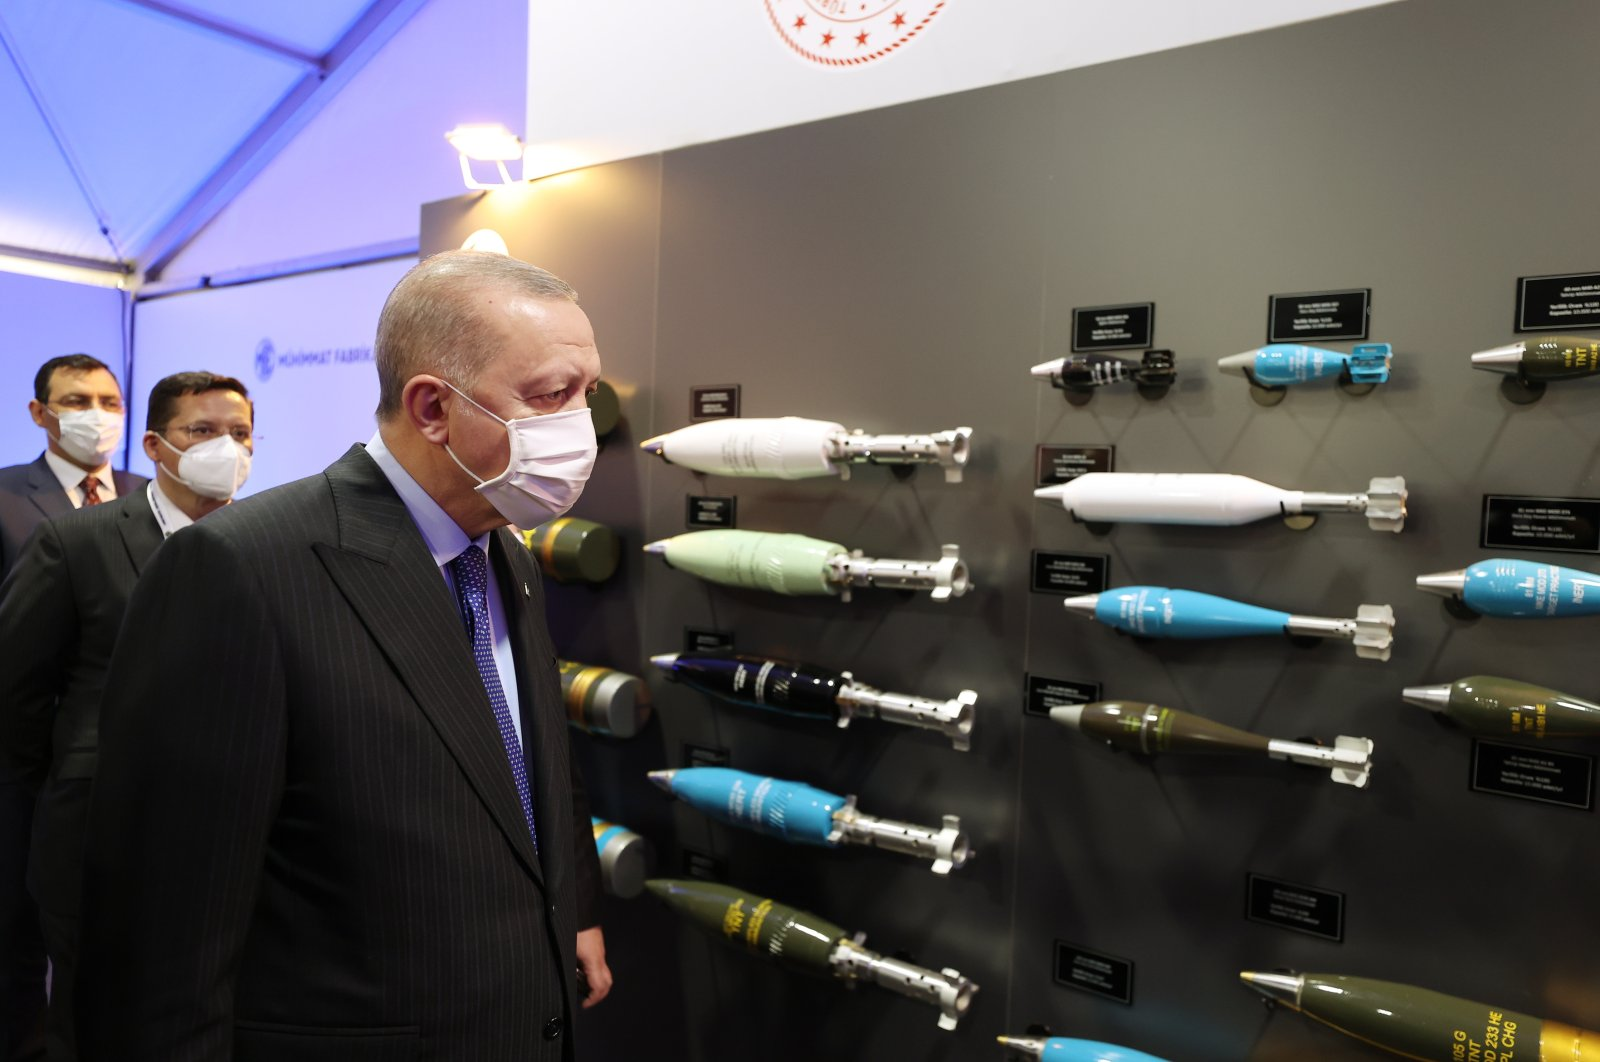 President Recep Tayyip Erdoğan inspects ammunitions at the newly opened MKEK factory in Ankara, Turkey, April 29, 2021. (AA Photo)